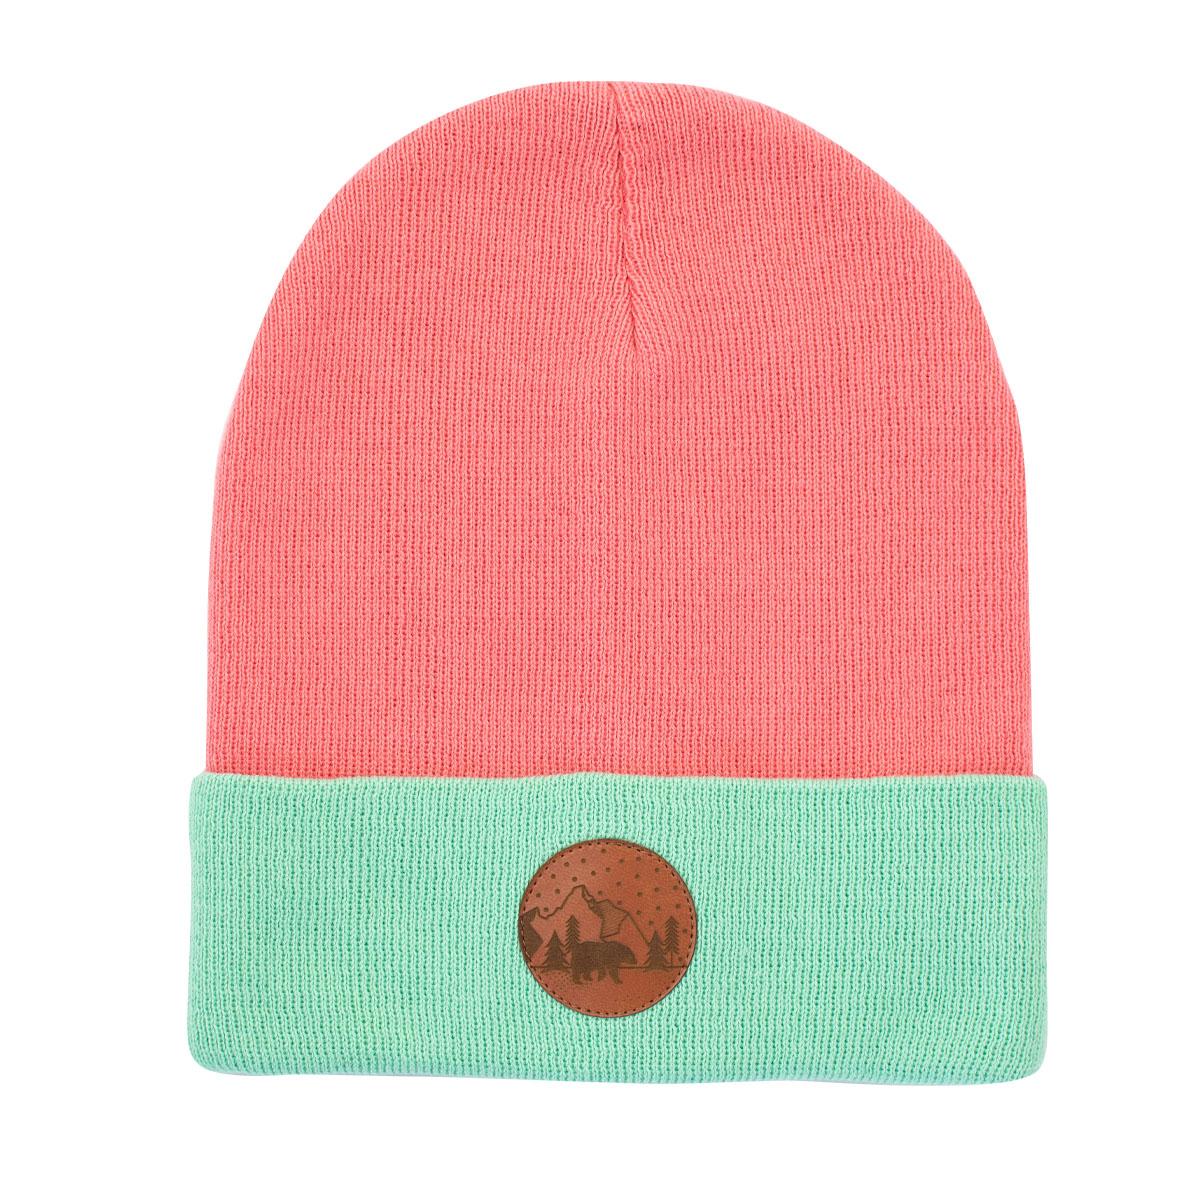 hat_beanie_cotton_wrap_pink306M_50056L_5906742640830